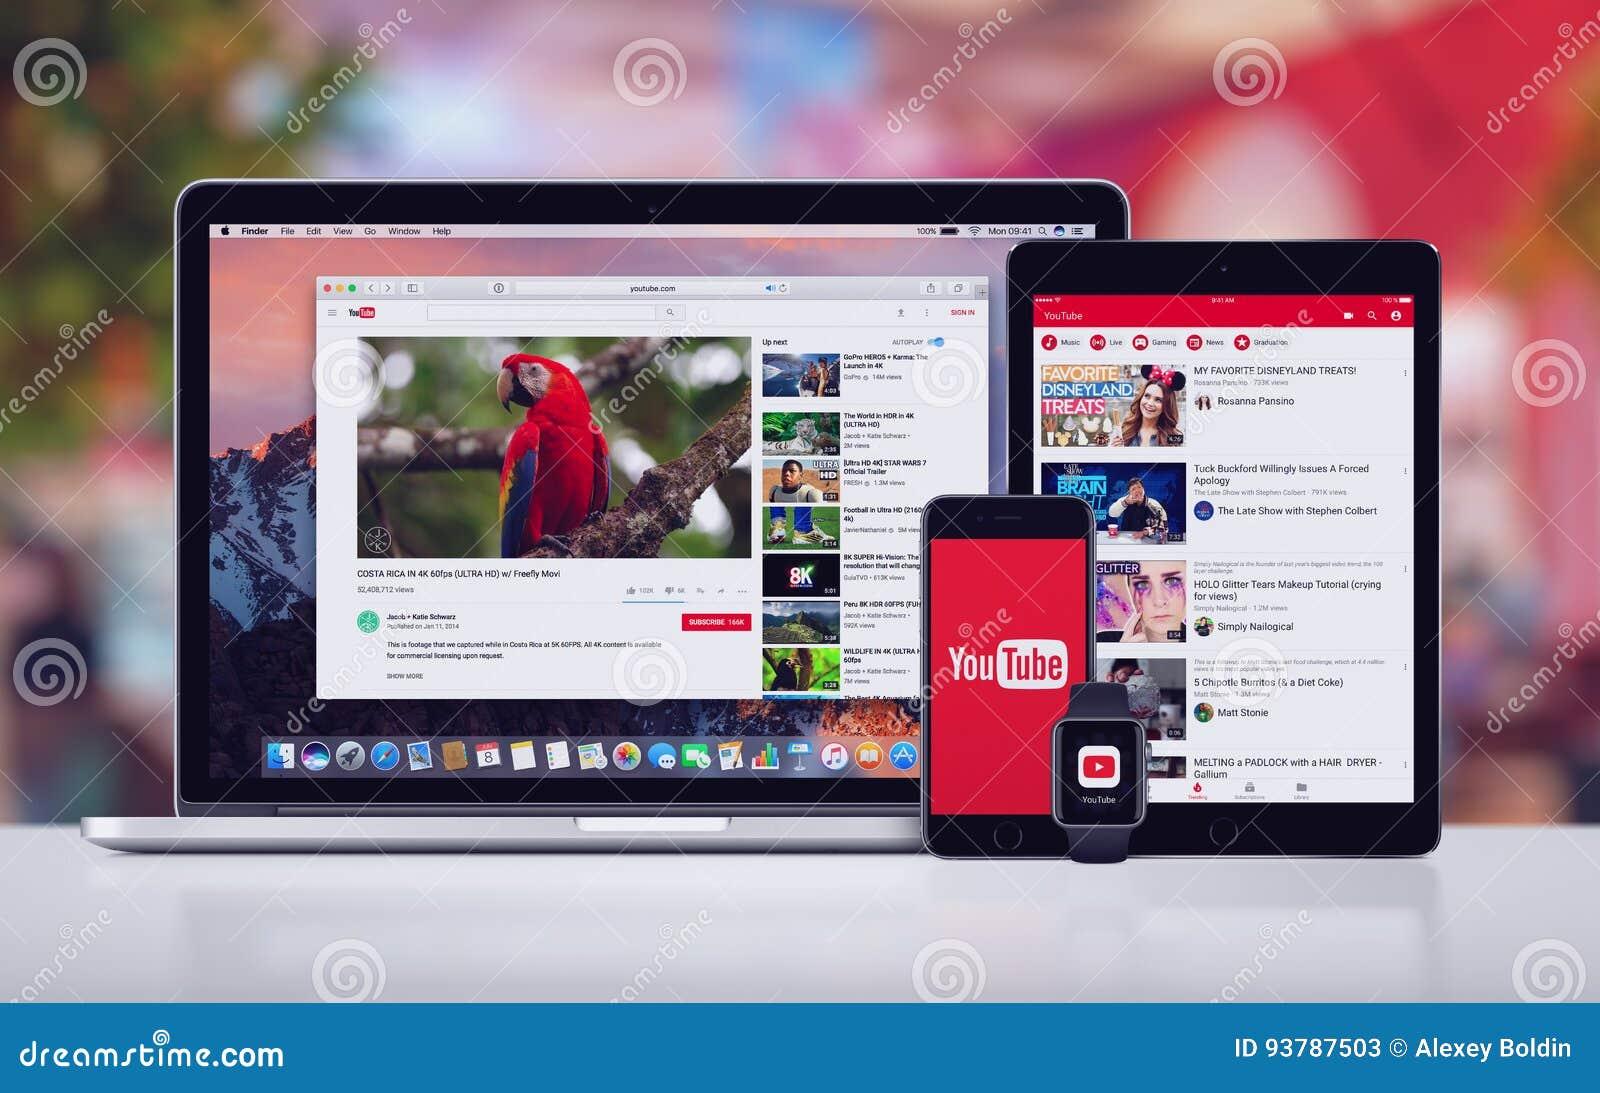 Youtube no ipad pro apple do iphone 7 de apple olha e macbook pro download comp ccuart Image collections